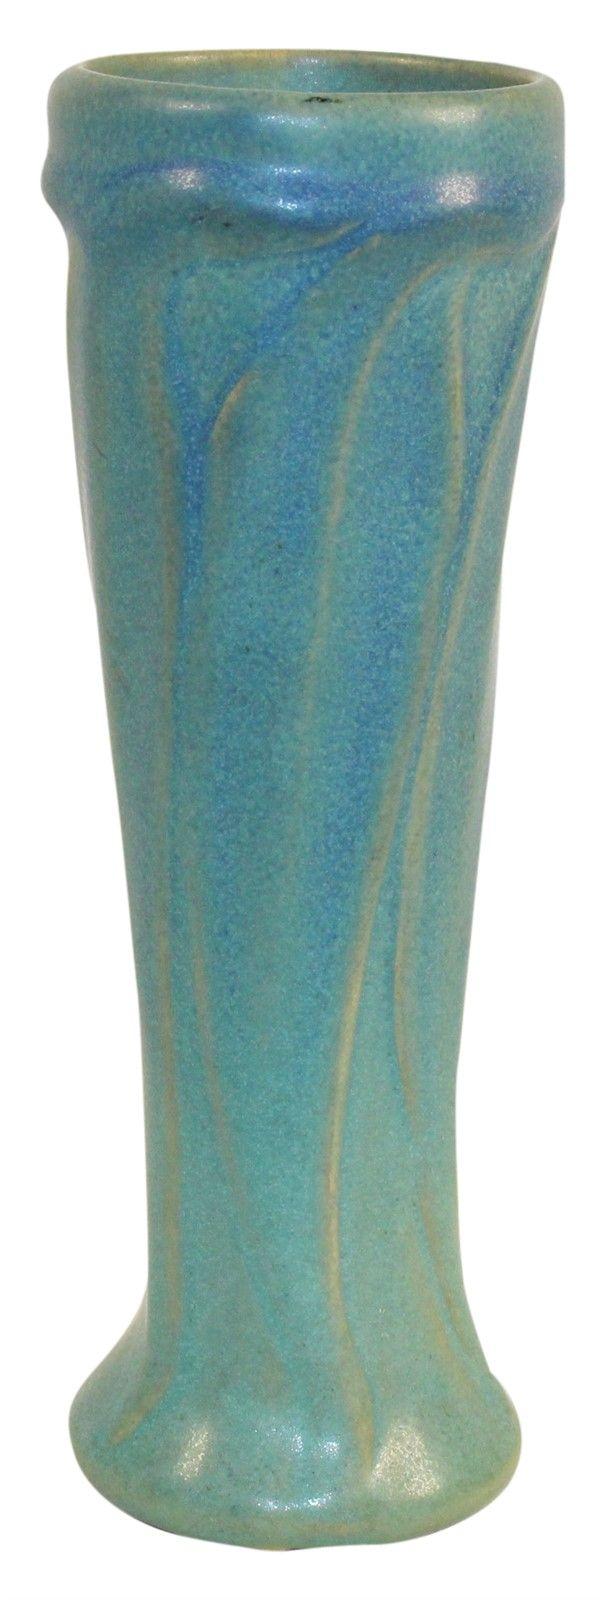 186 best van briggle pottery images on pinterest antique pottery van briggle pottery 1918 leaves vase shape 863 reviewsmspy